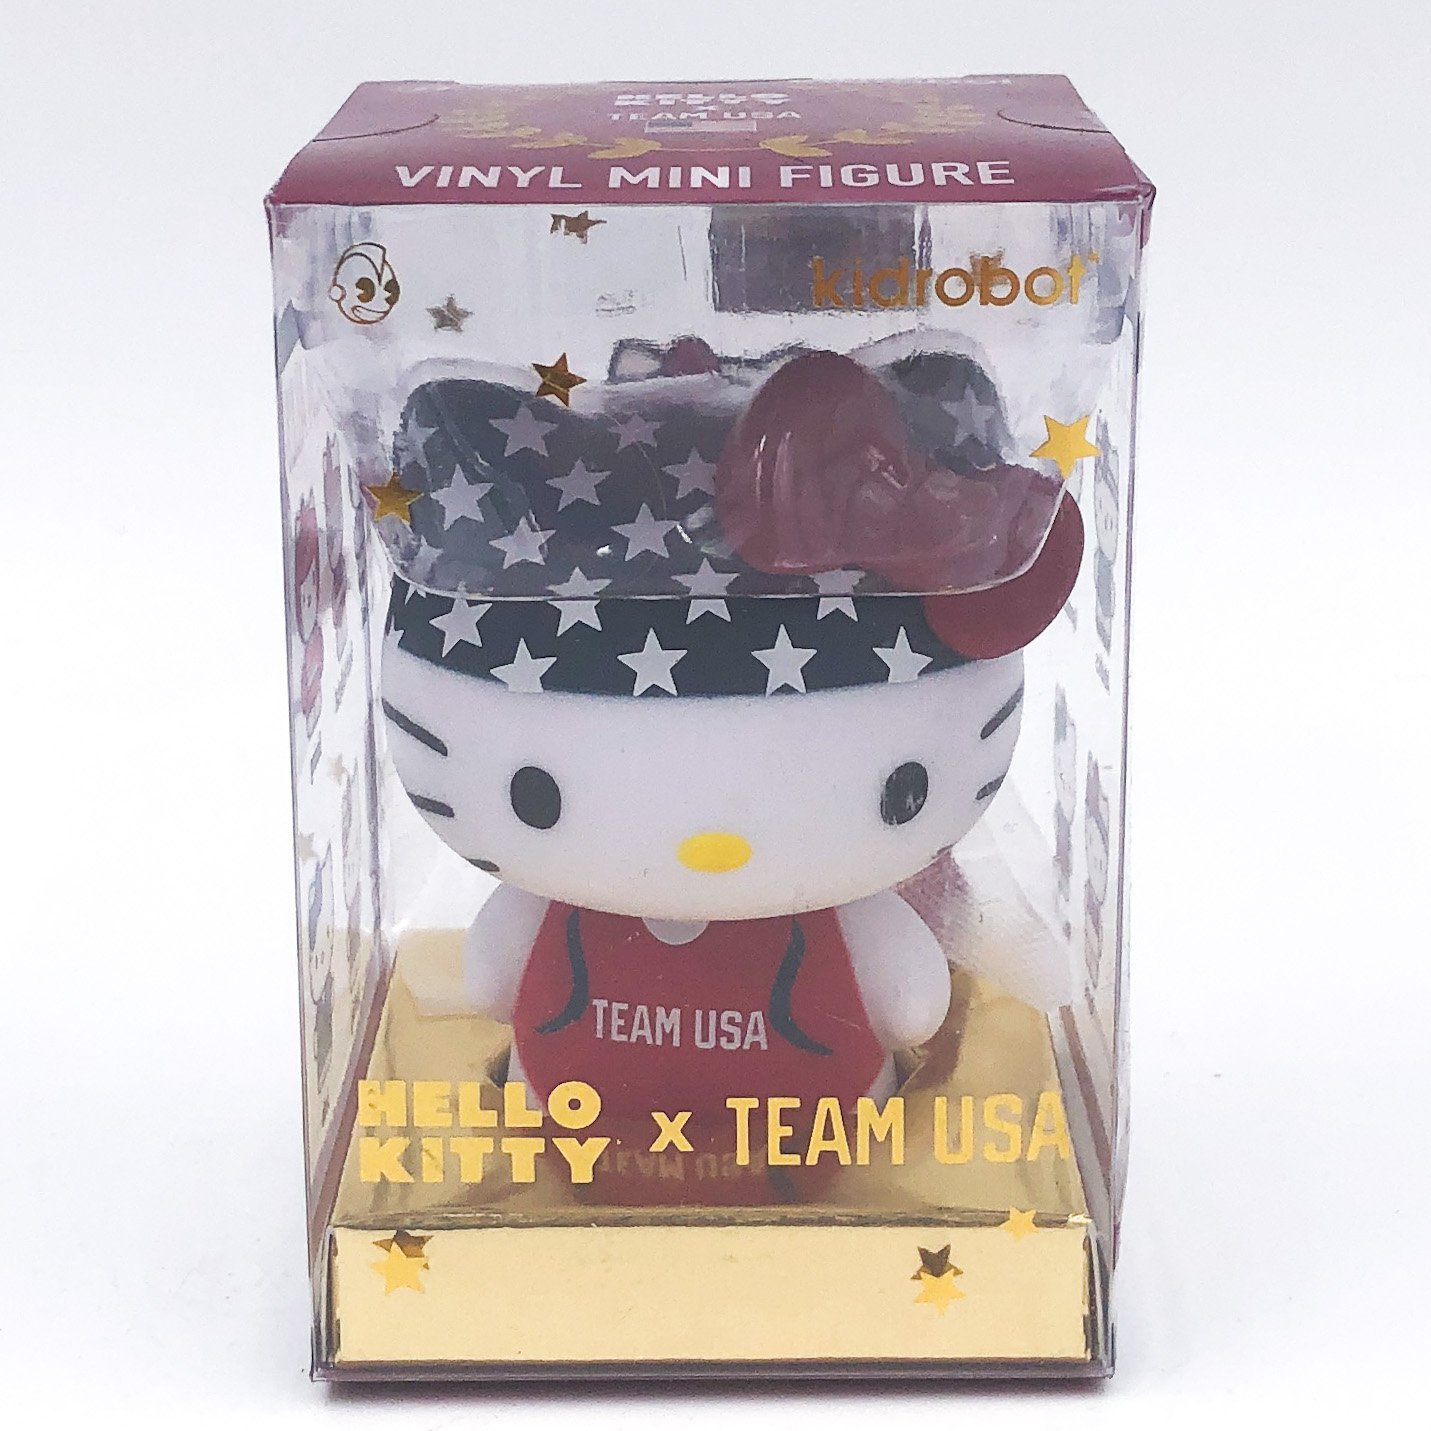 Hello Kitty x Team USA Swimming Vinyl Mini Figure Kidrobot